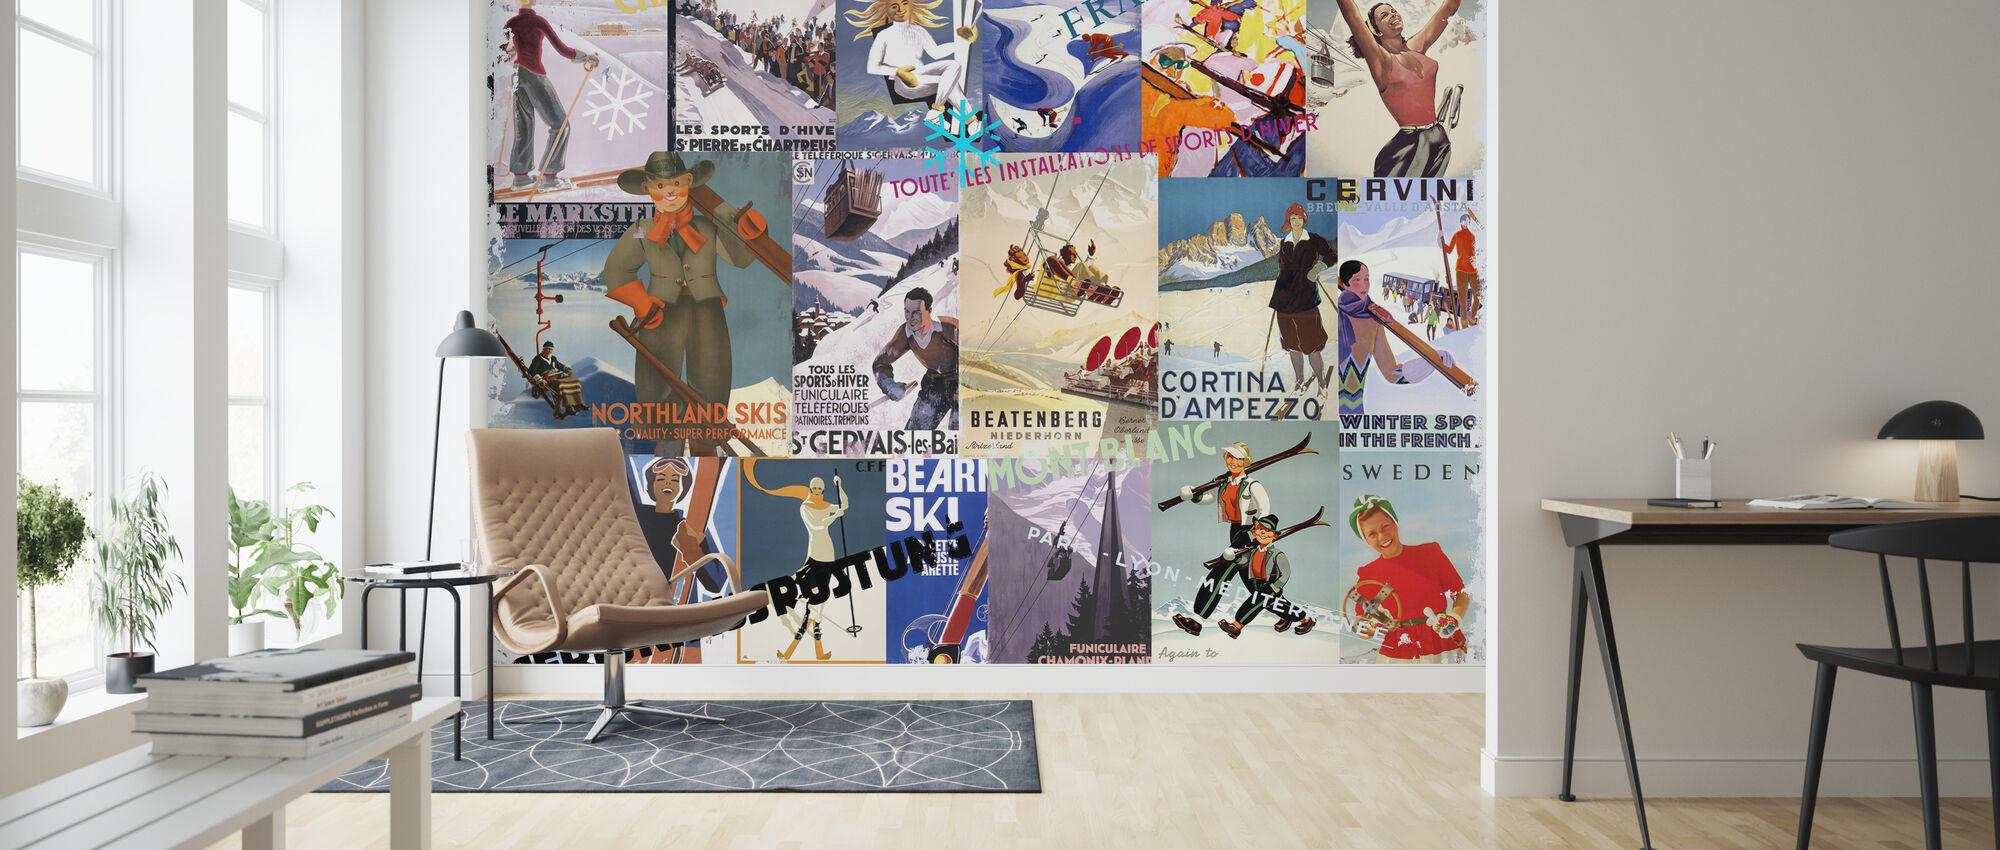 Skigebieden Collage - Behang - Woonkamer